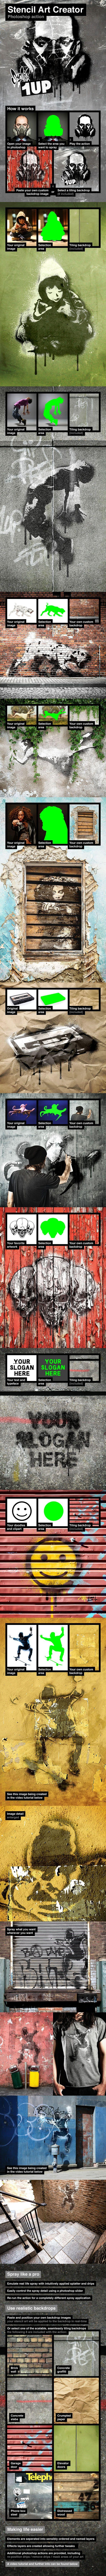 Stencil Art Creator Photoshop Action  #banksy #urban • Download ➝ https://graphicriver.net/item/stencil-art-creator-photoshop-action/18484365?ref=pxcr